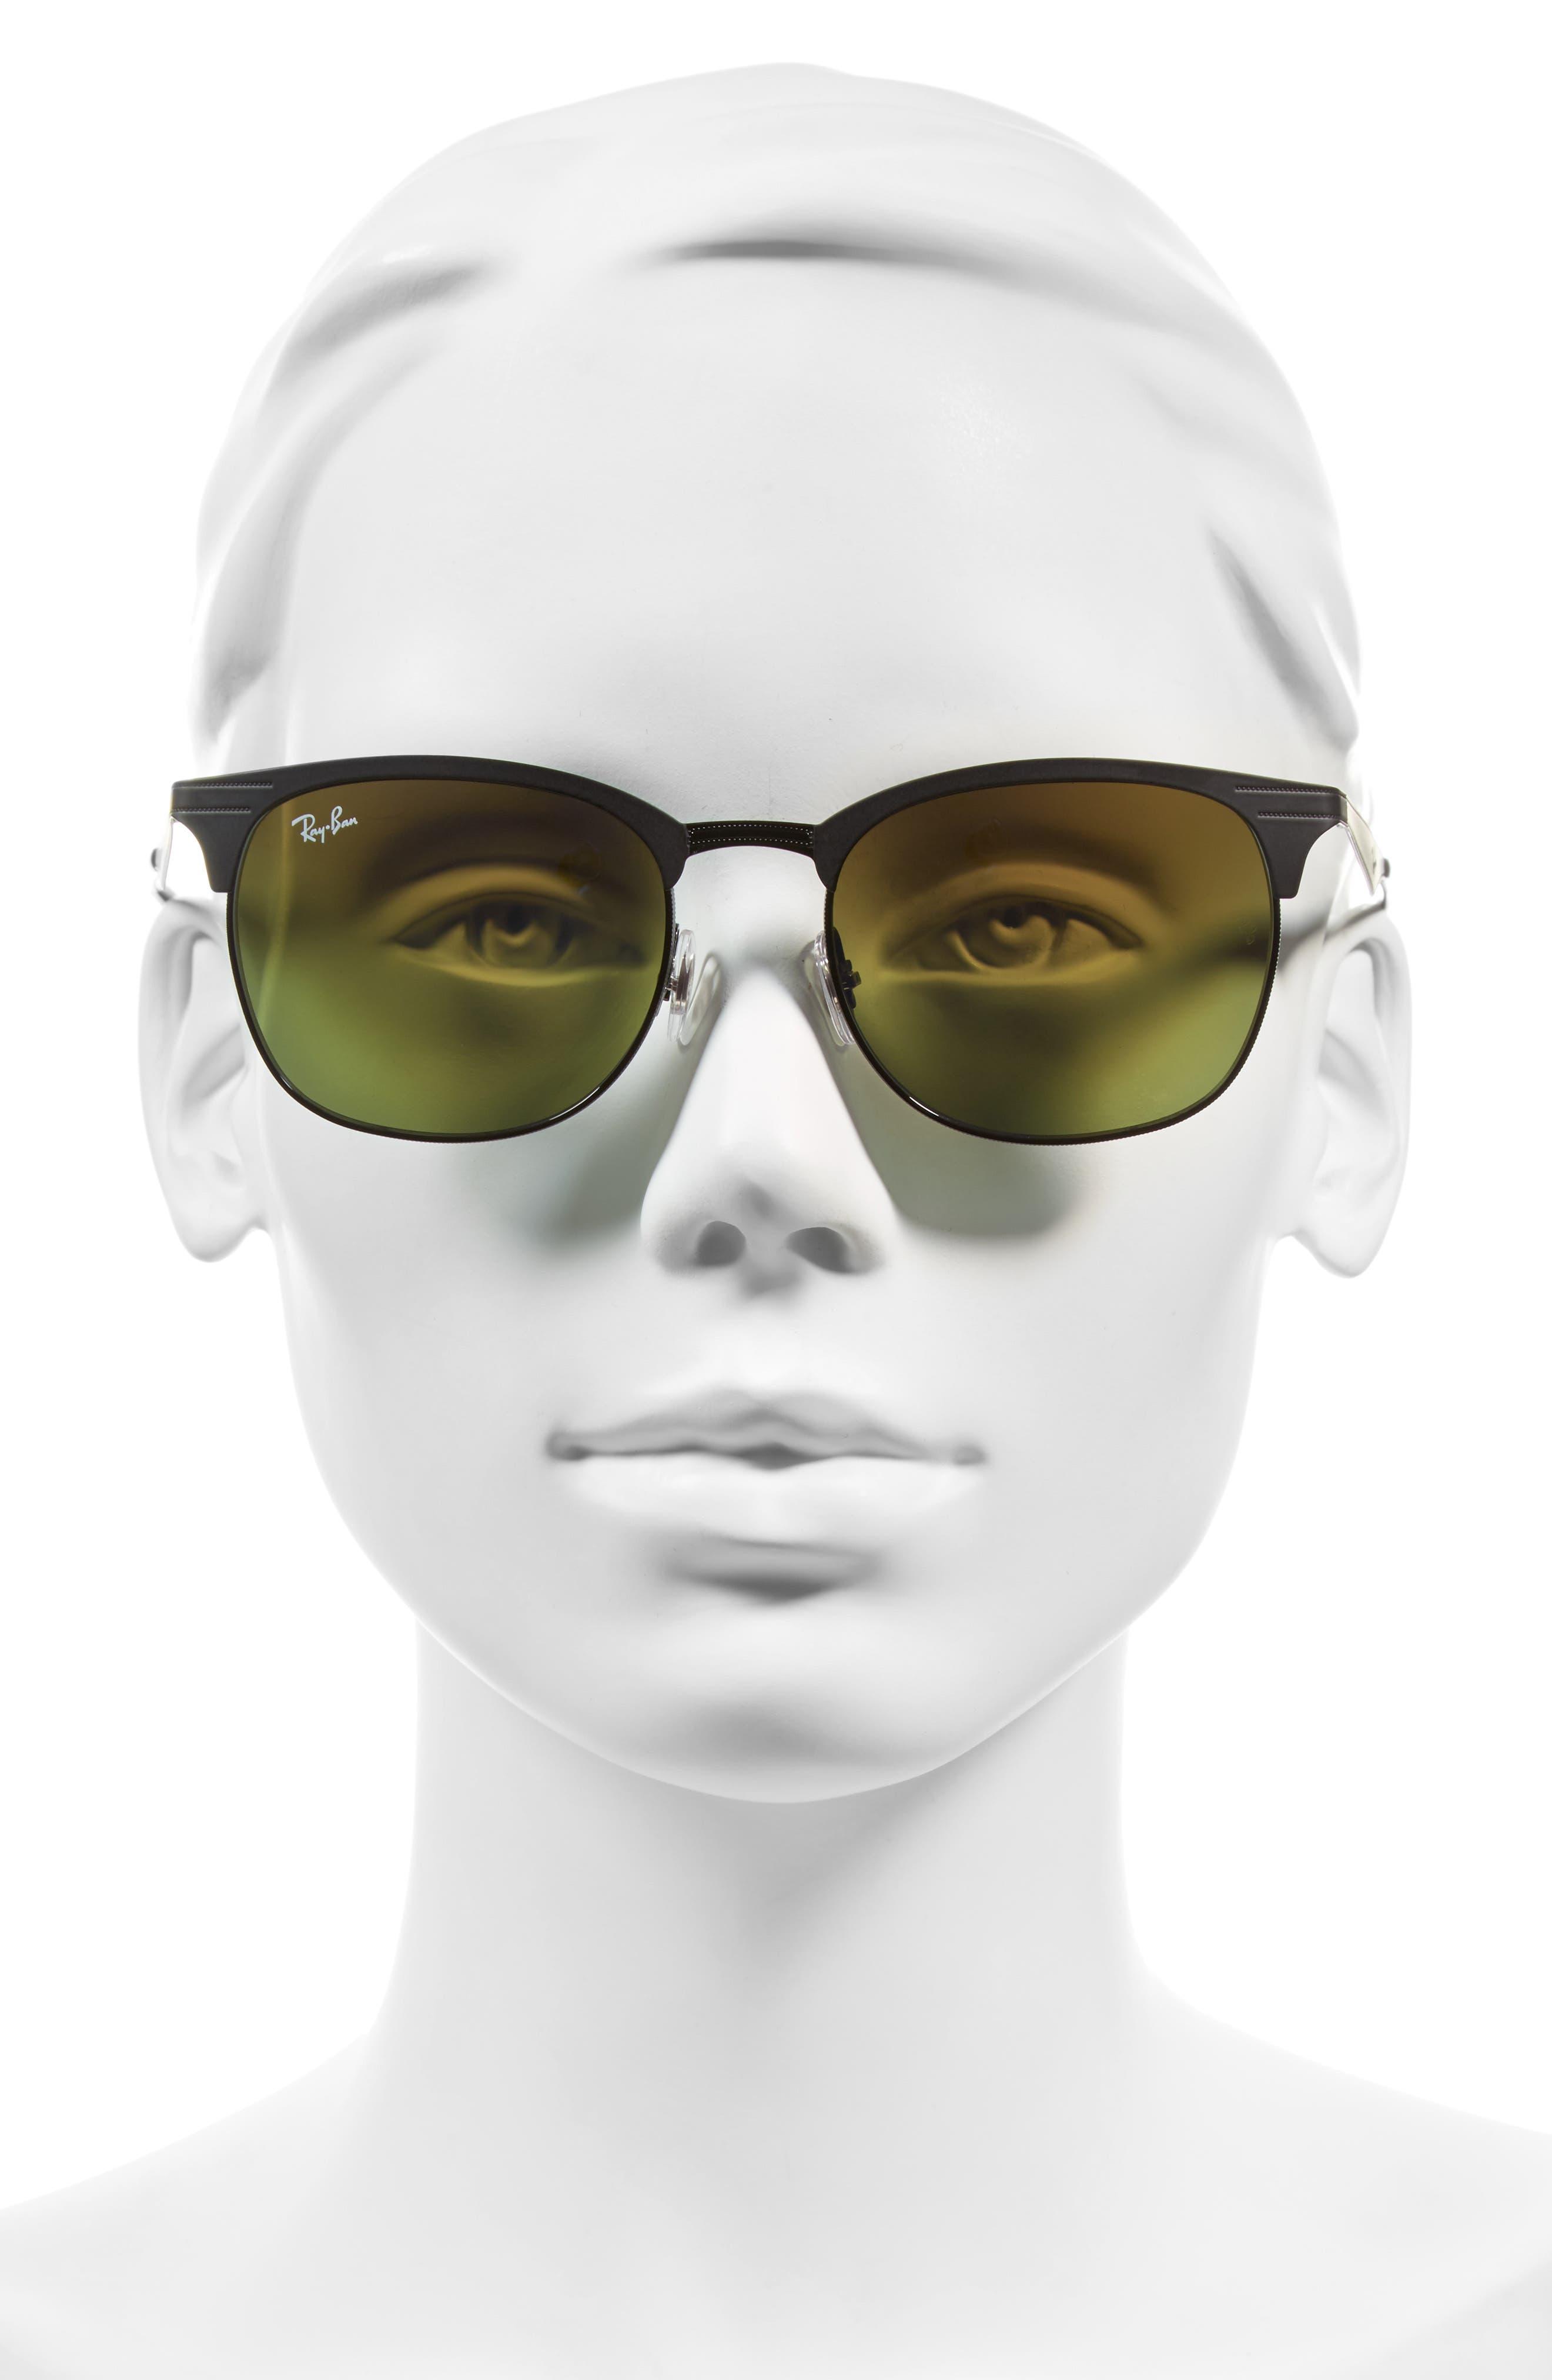 Highstreet 53mm Sunglasses,                             Alternate thumbnail 2, color,                             Black/ Blue